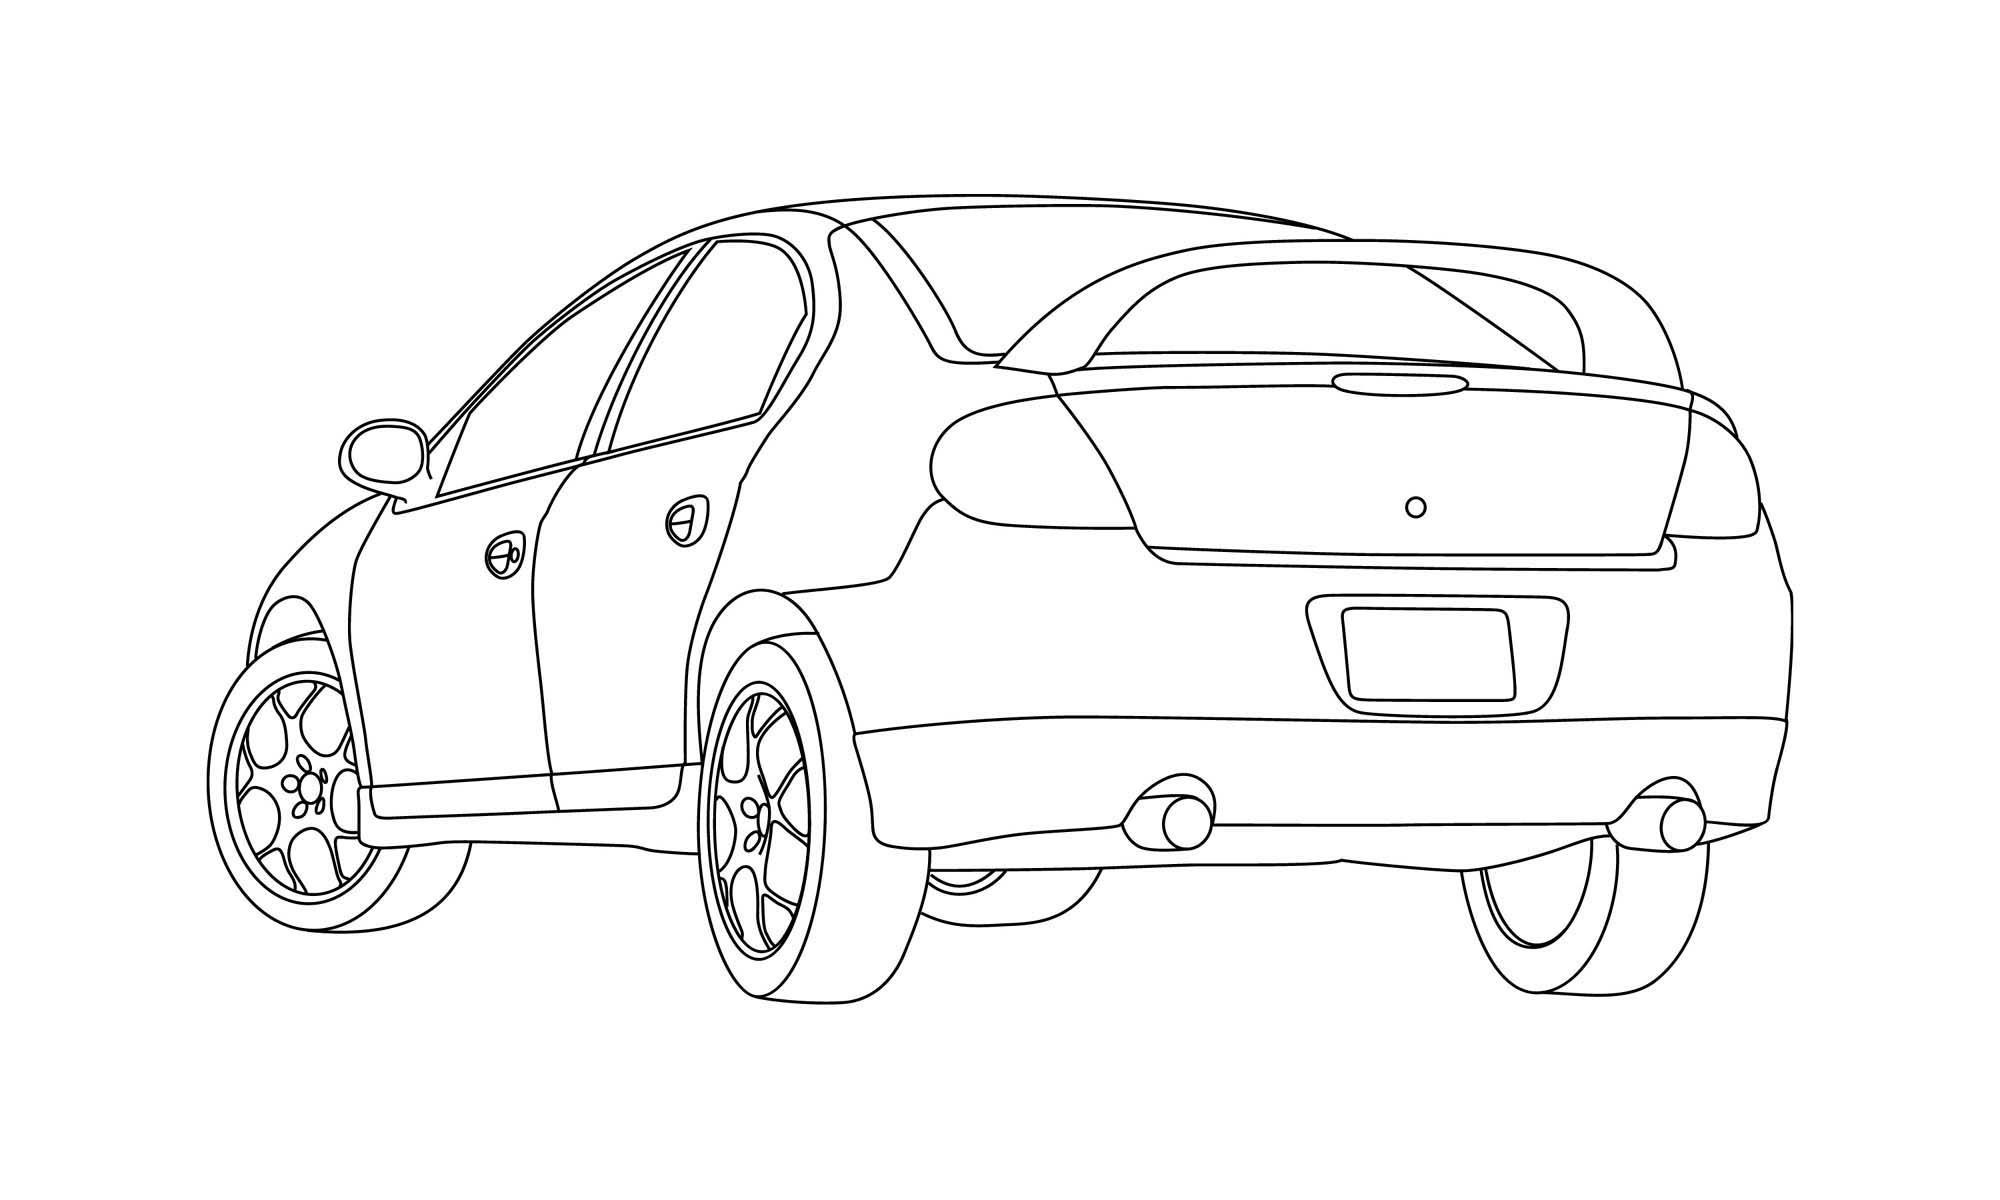 Dibujo Paa Colorear De Motor Dodge Hemi Dibujos Para